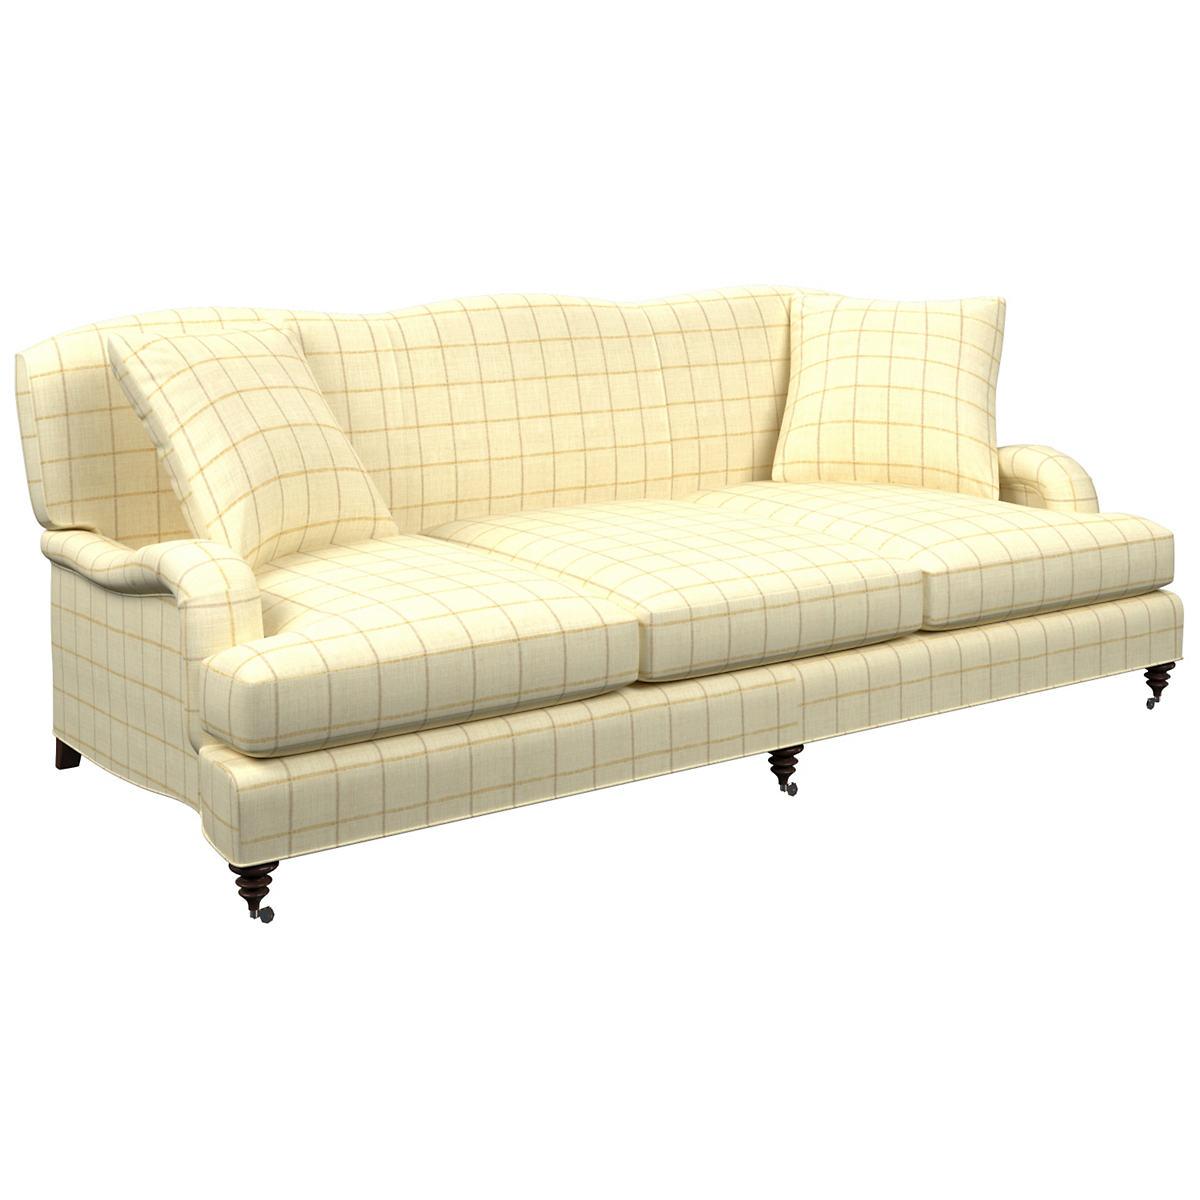 Chatham Tattersall Gold/Natural Litchfield 3 Seater Sofa